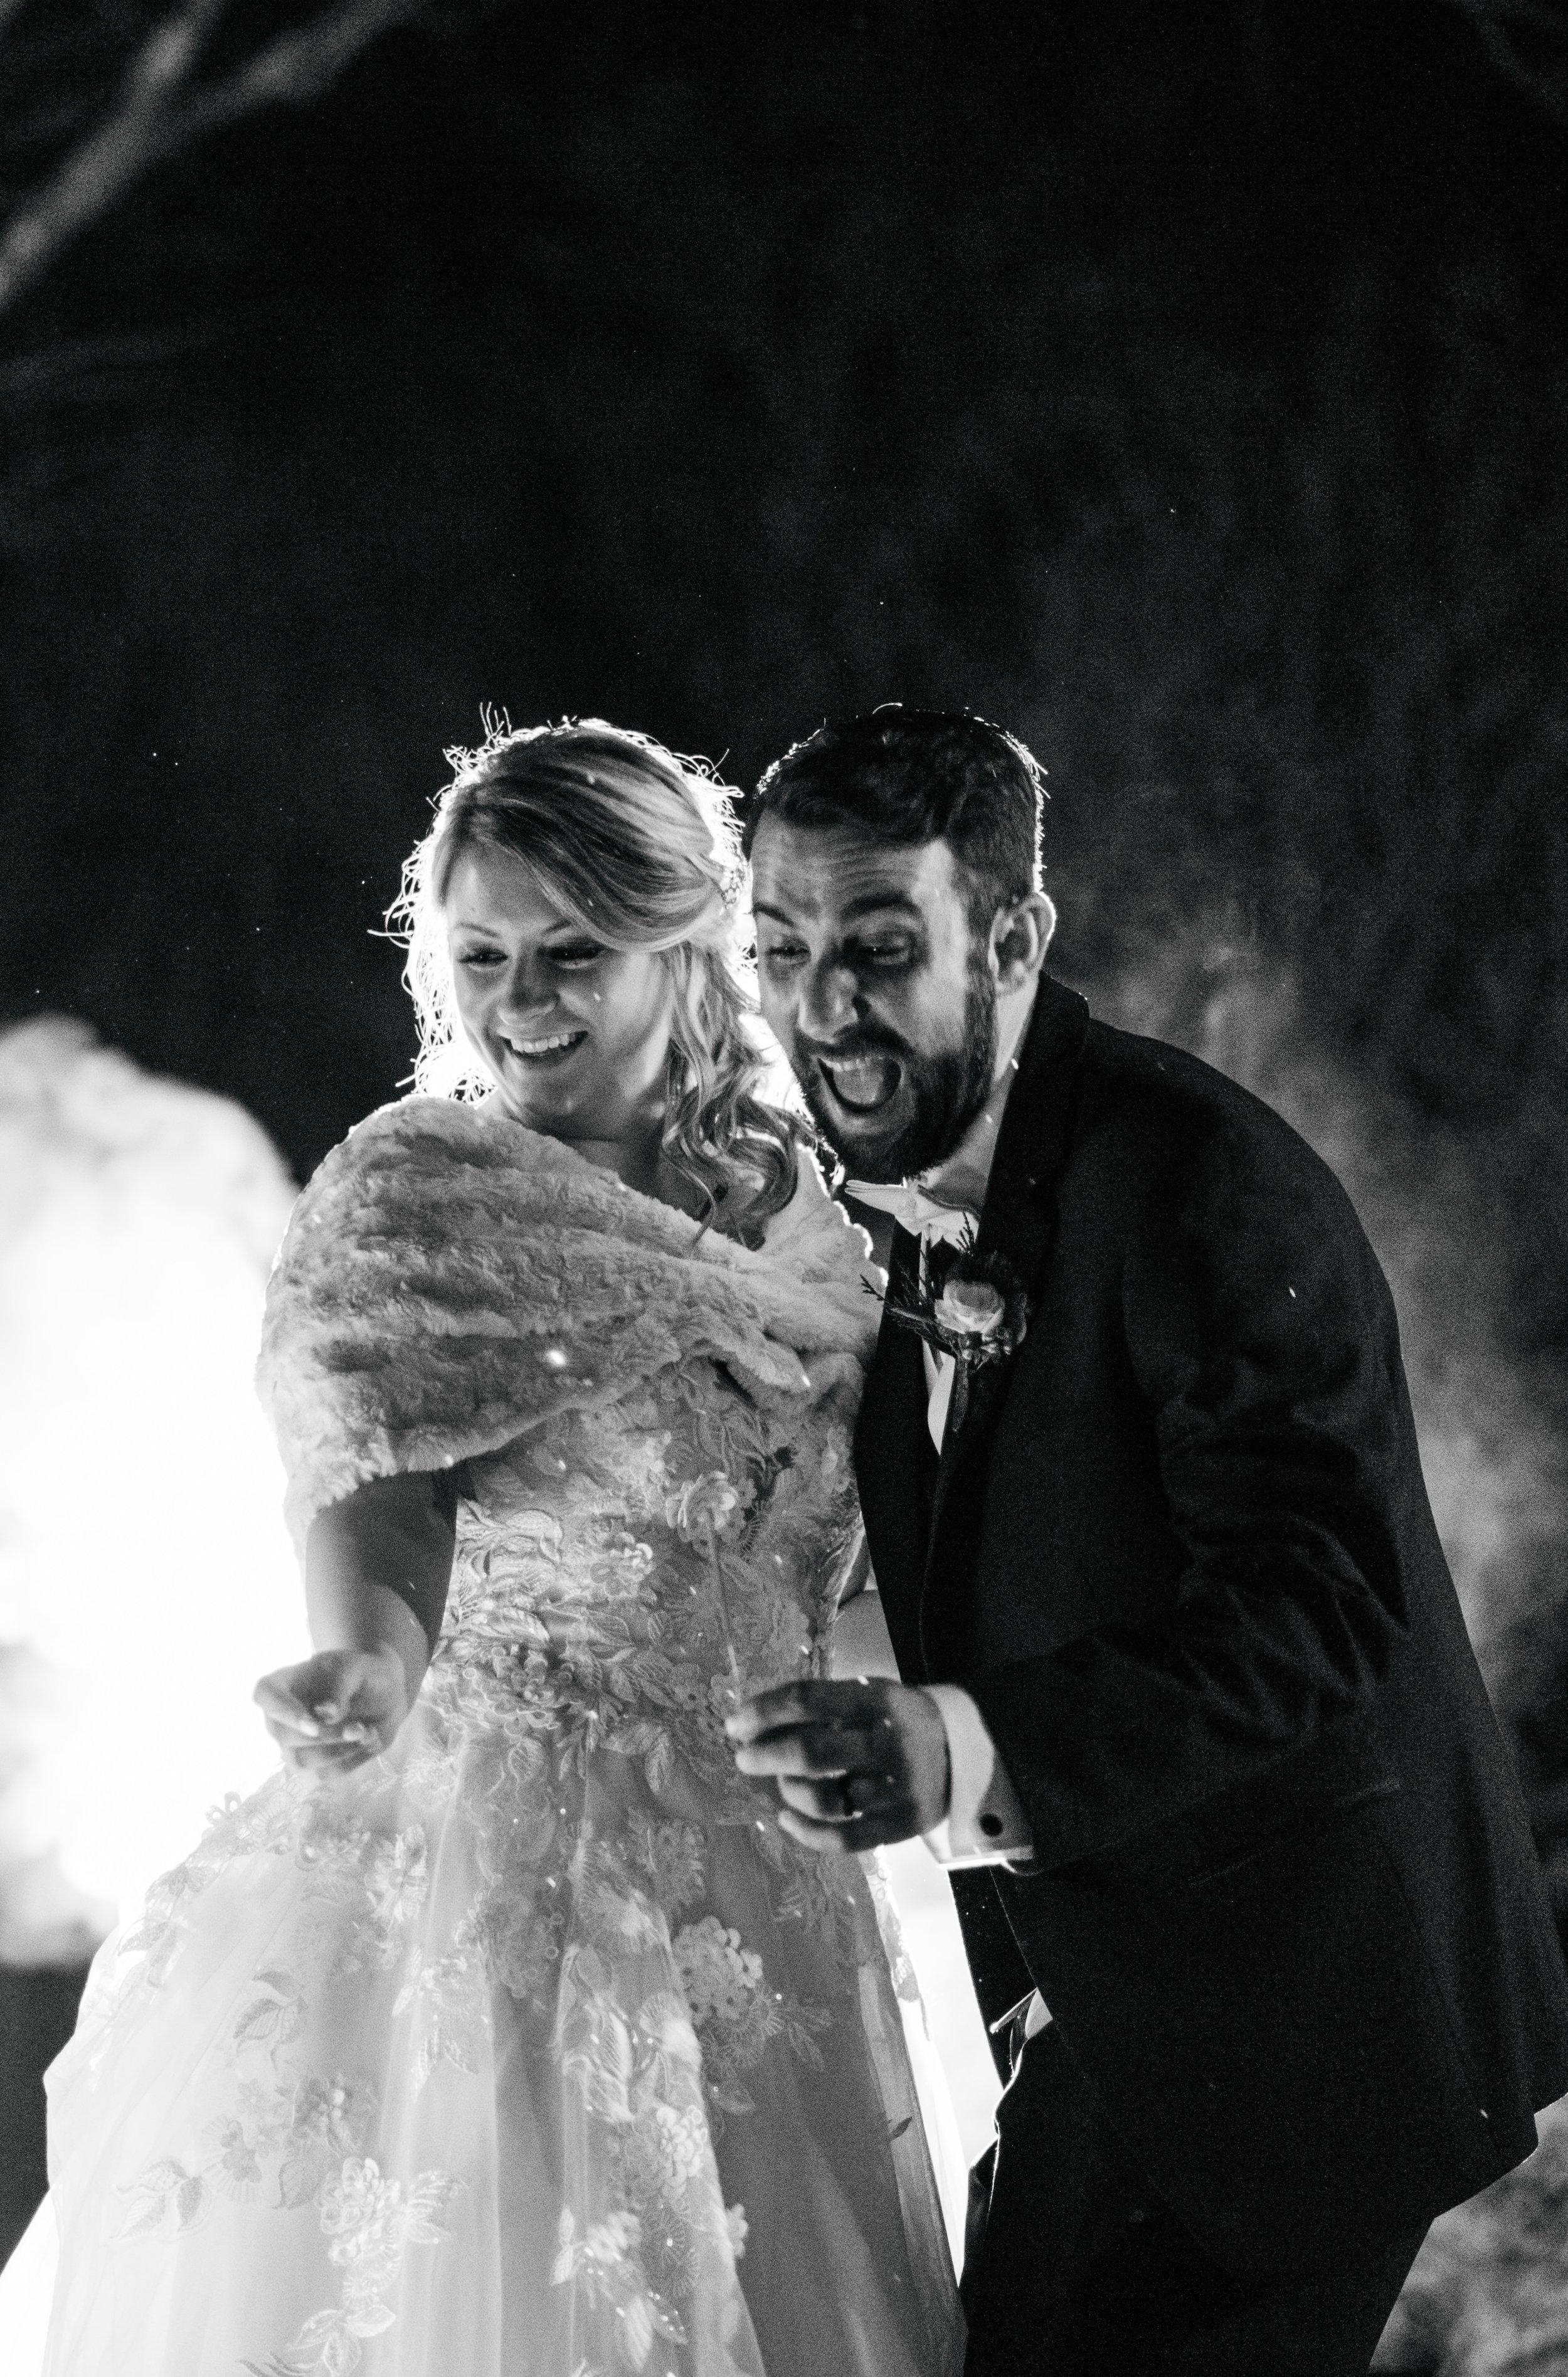 WeddingPhotos | NJPhotographer | Highlights-15-11.jpg